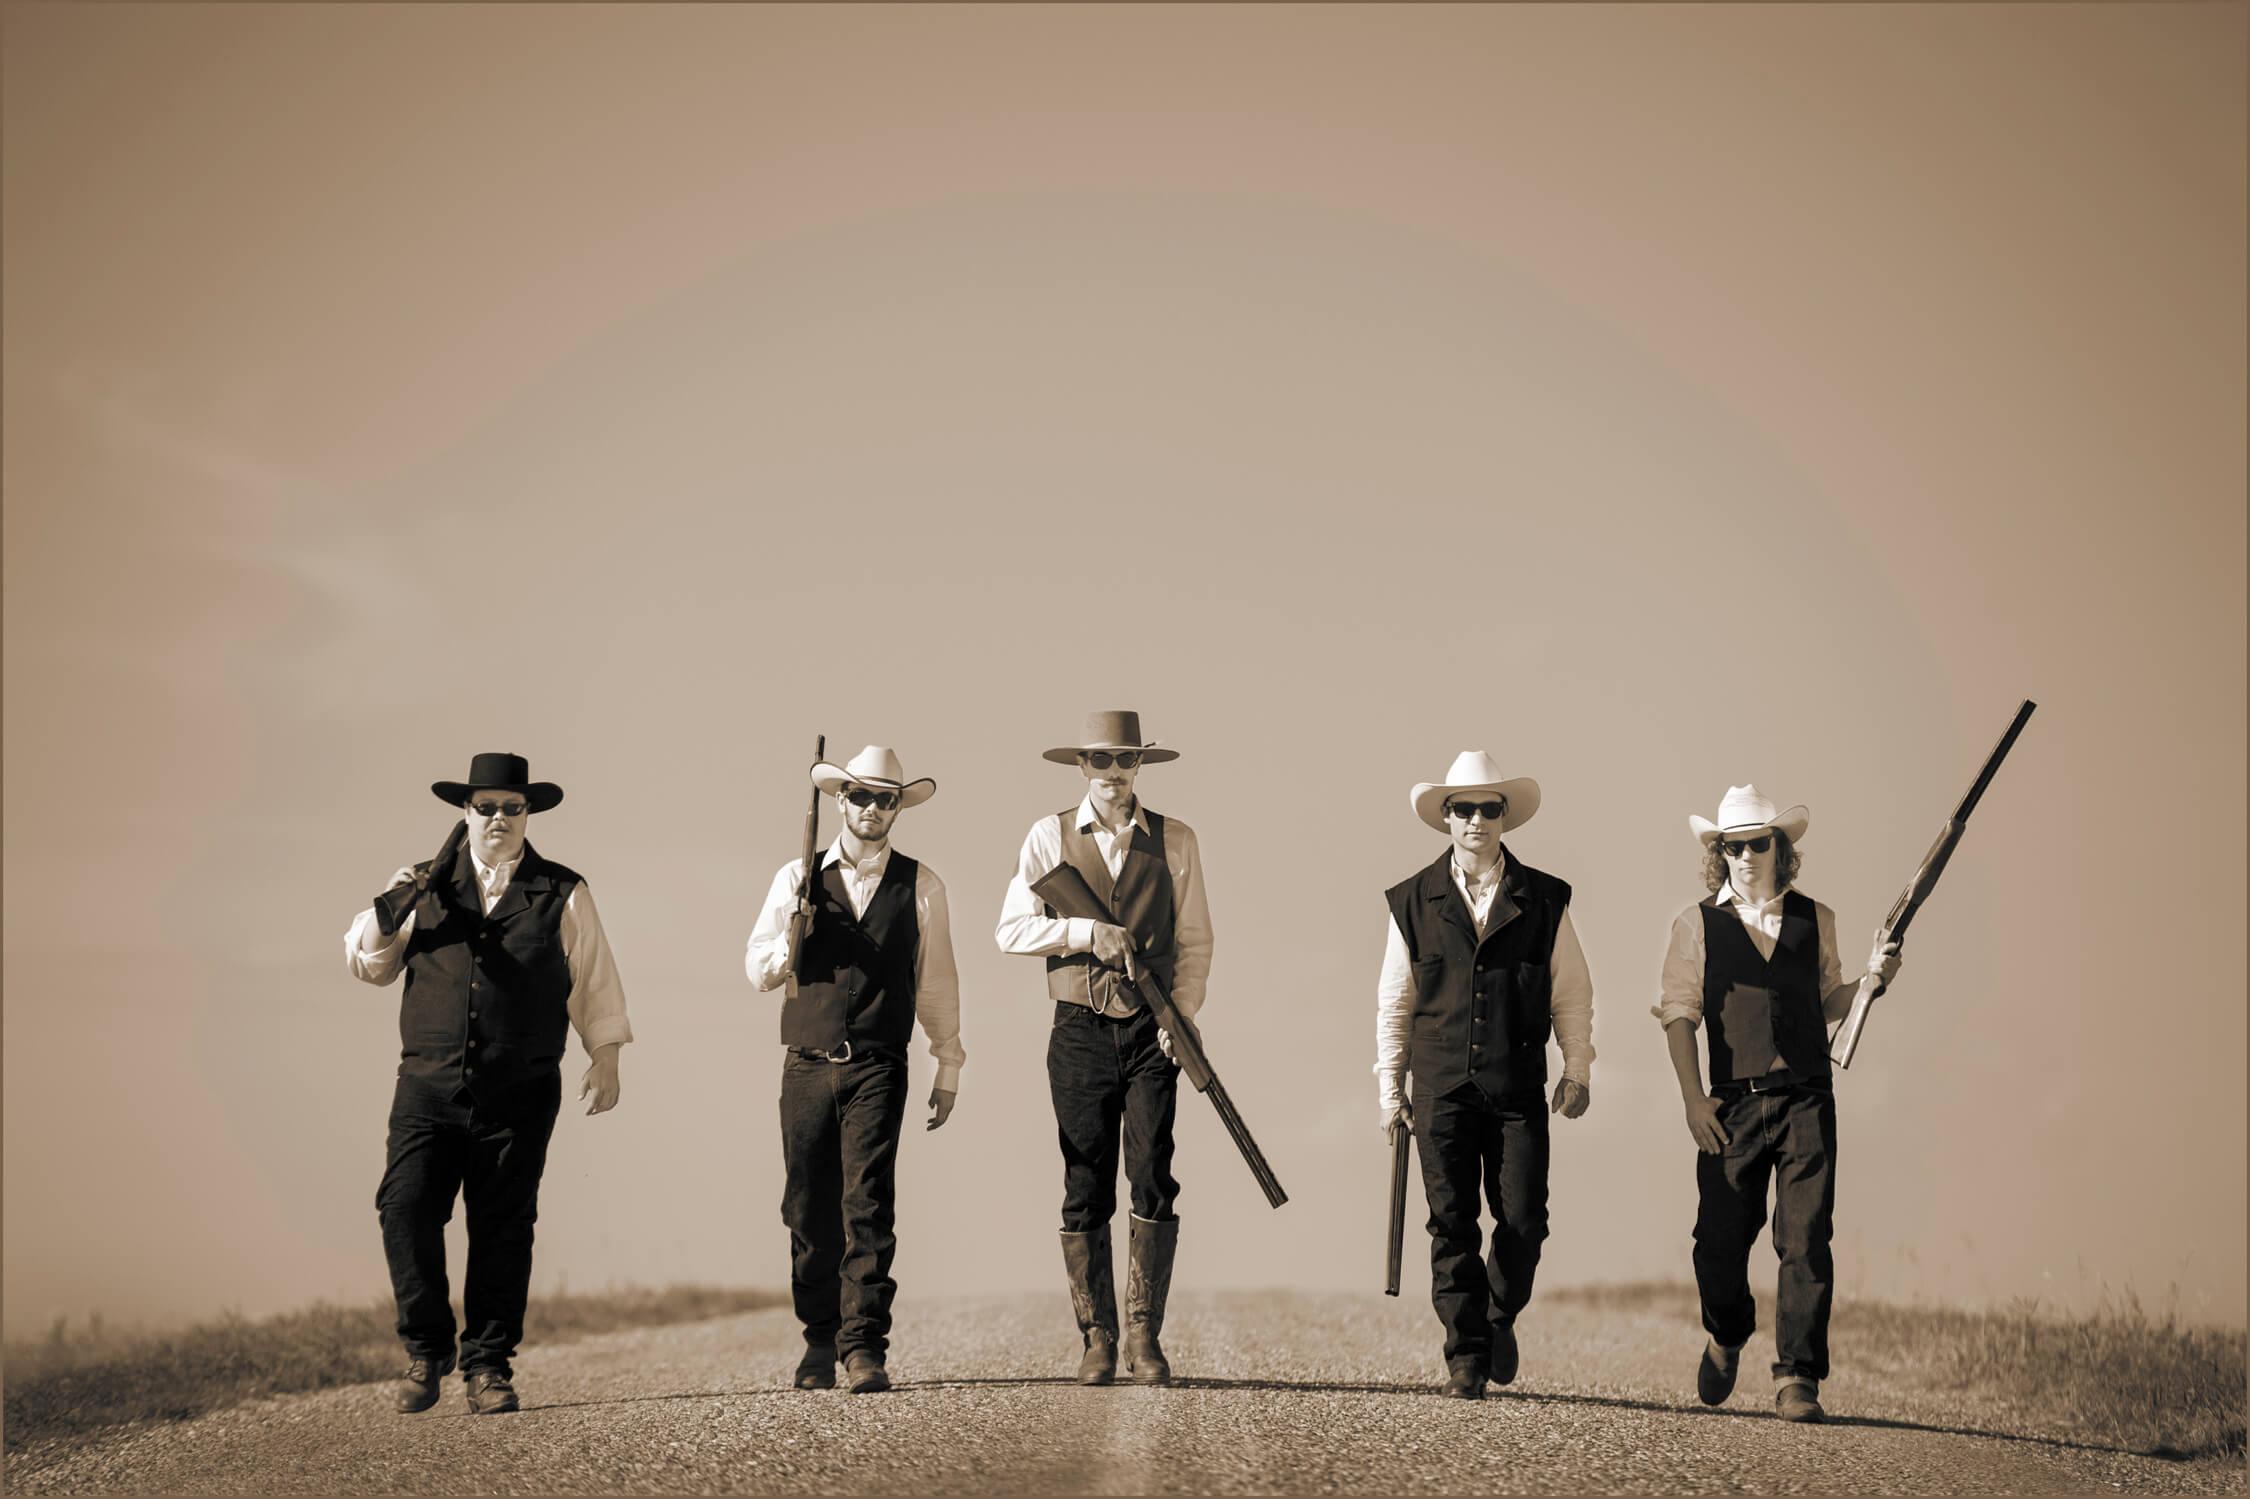 groom and groomsmen walking on open road holding guns